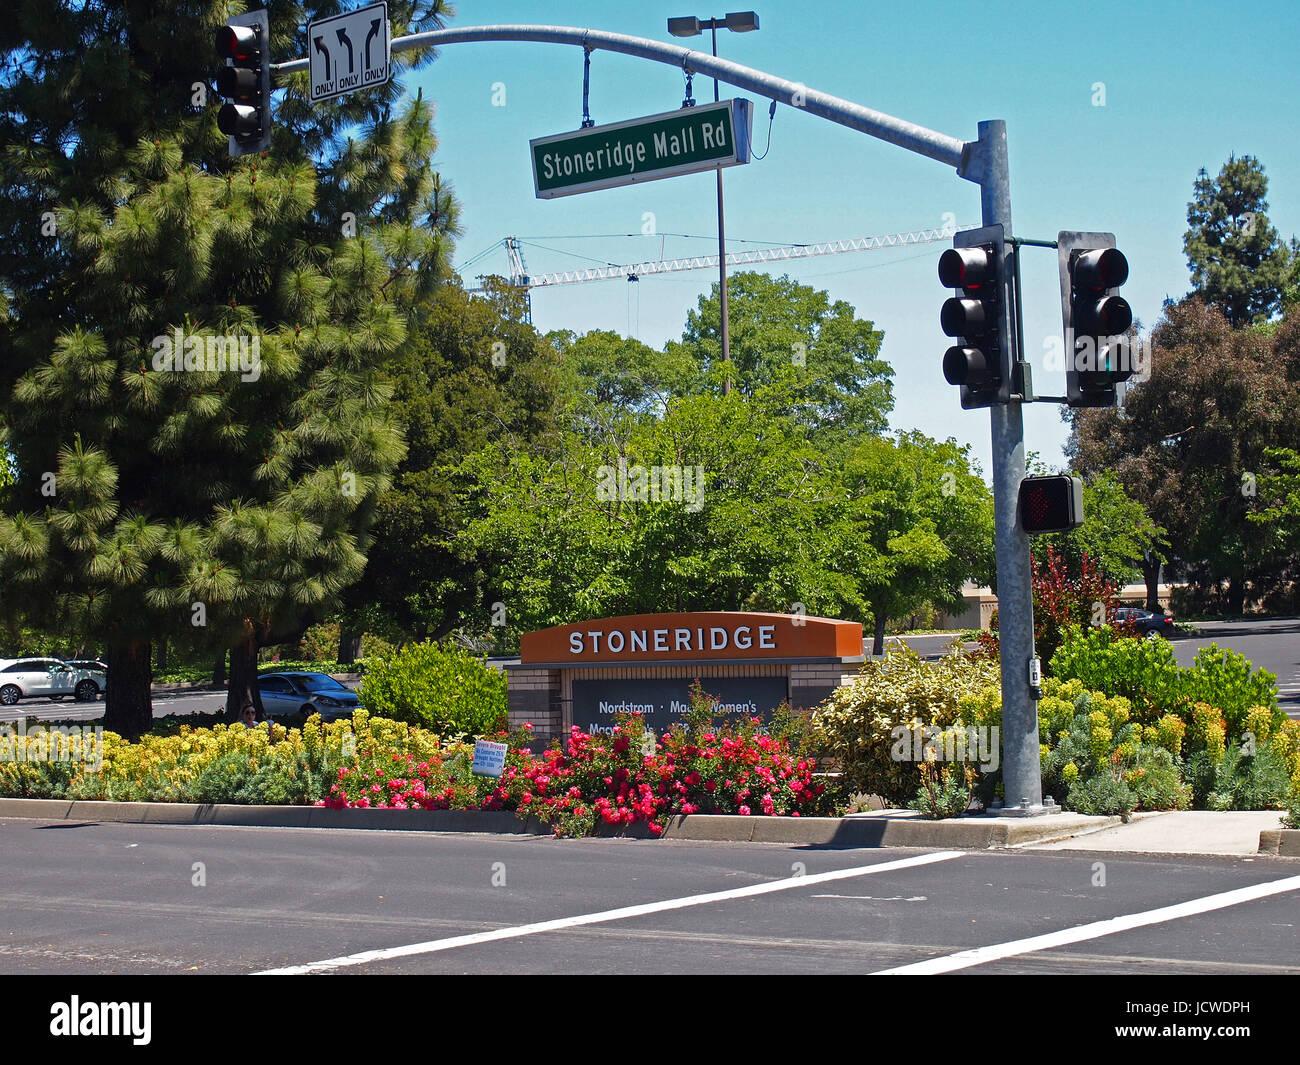 Stoneridge Shopping Center sign, Pleasanton, California, USA - Stock Image